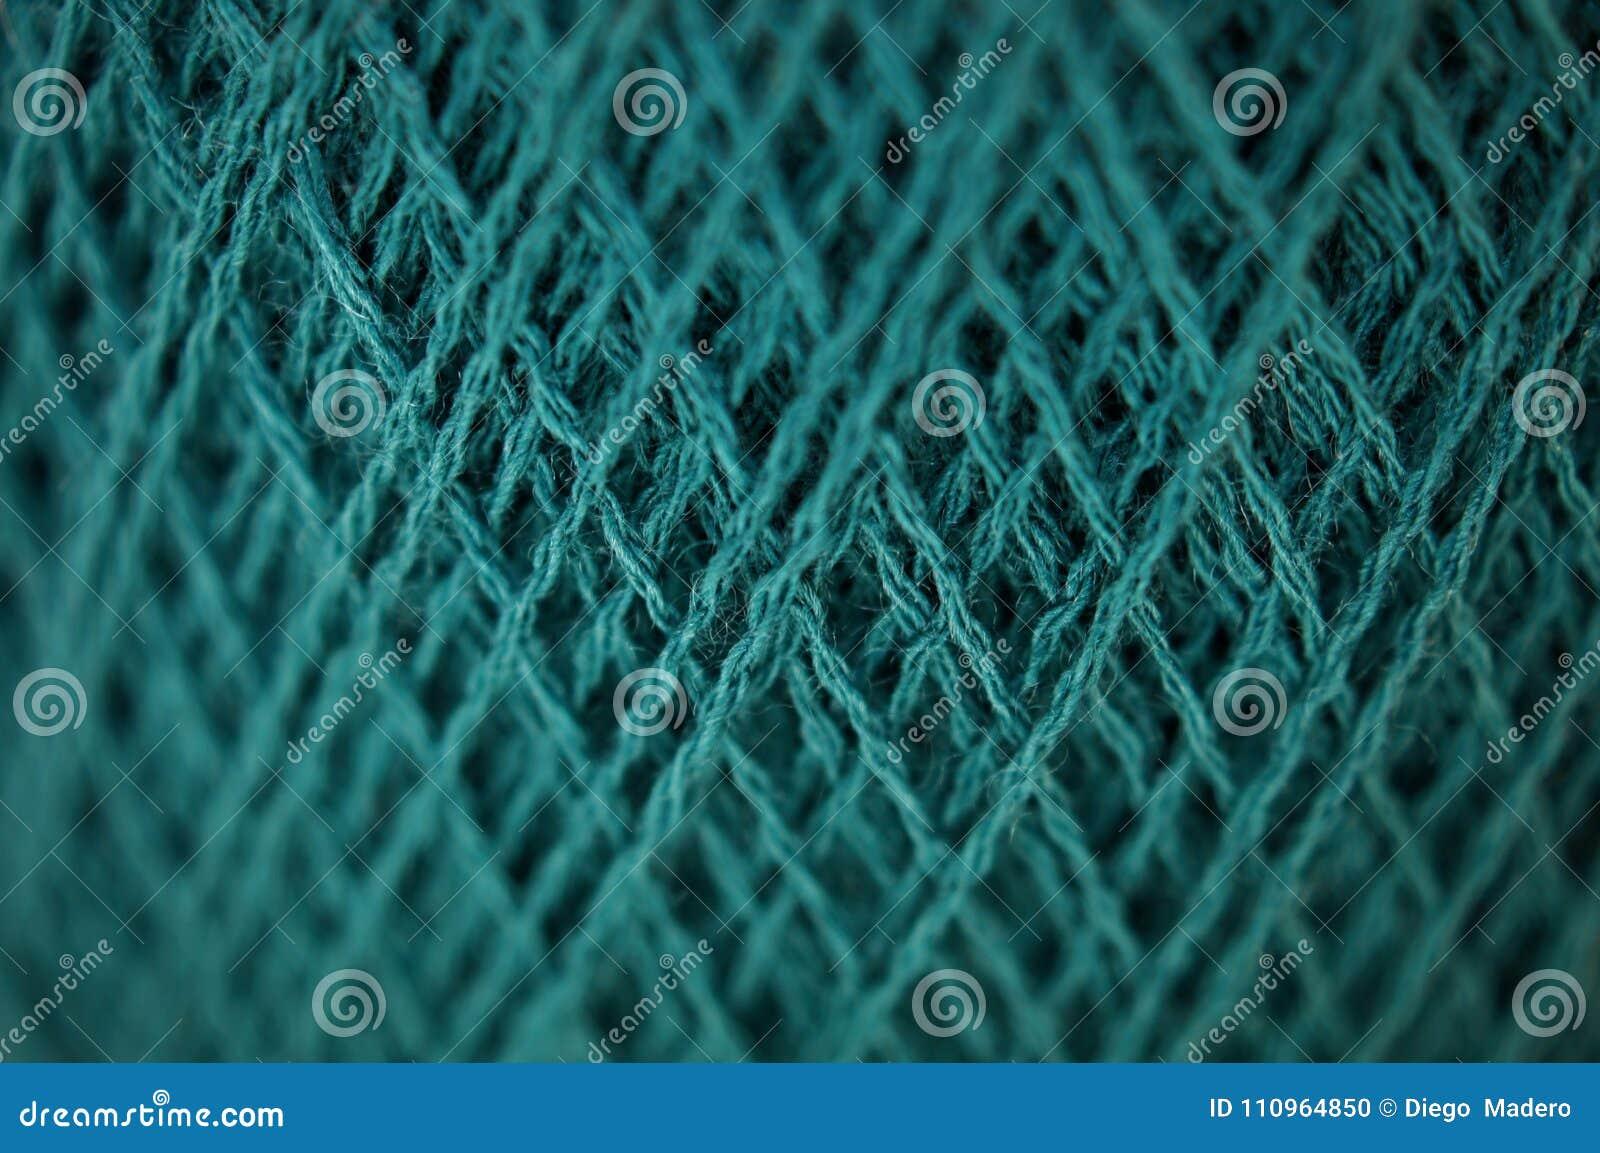 511d9bab83a772 Macro photo shot from some nice fine merino yarn in teal color macro shot  SONY DSC + Sony Macro Lens